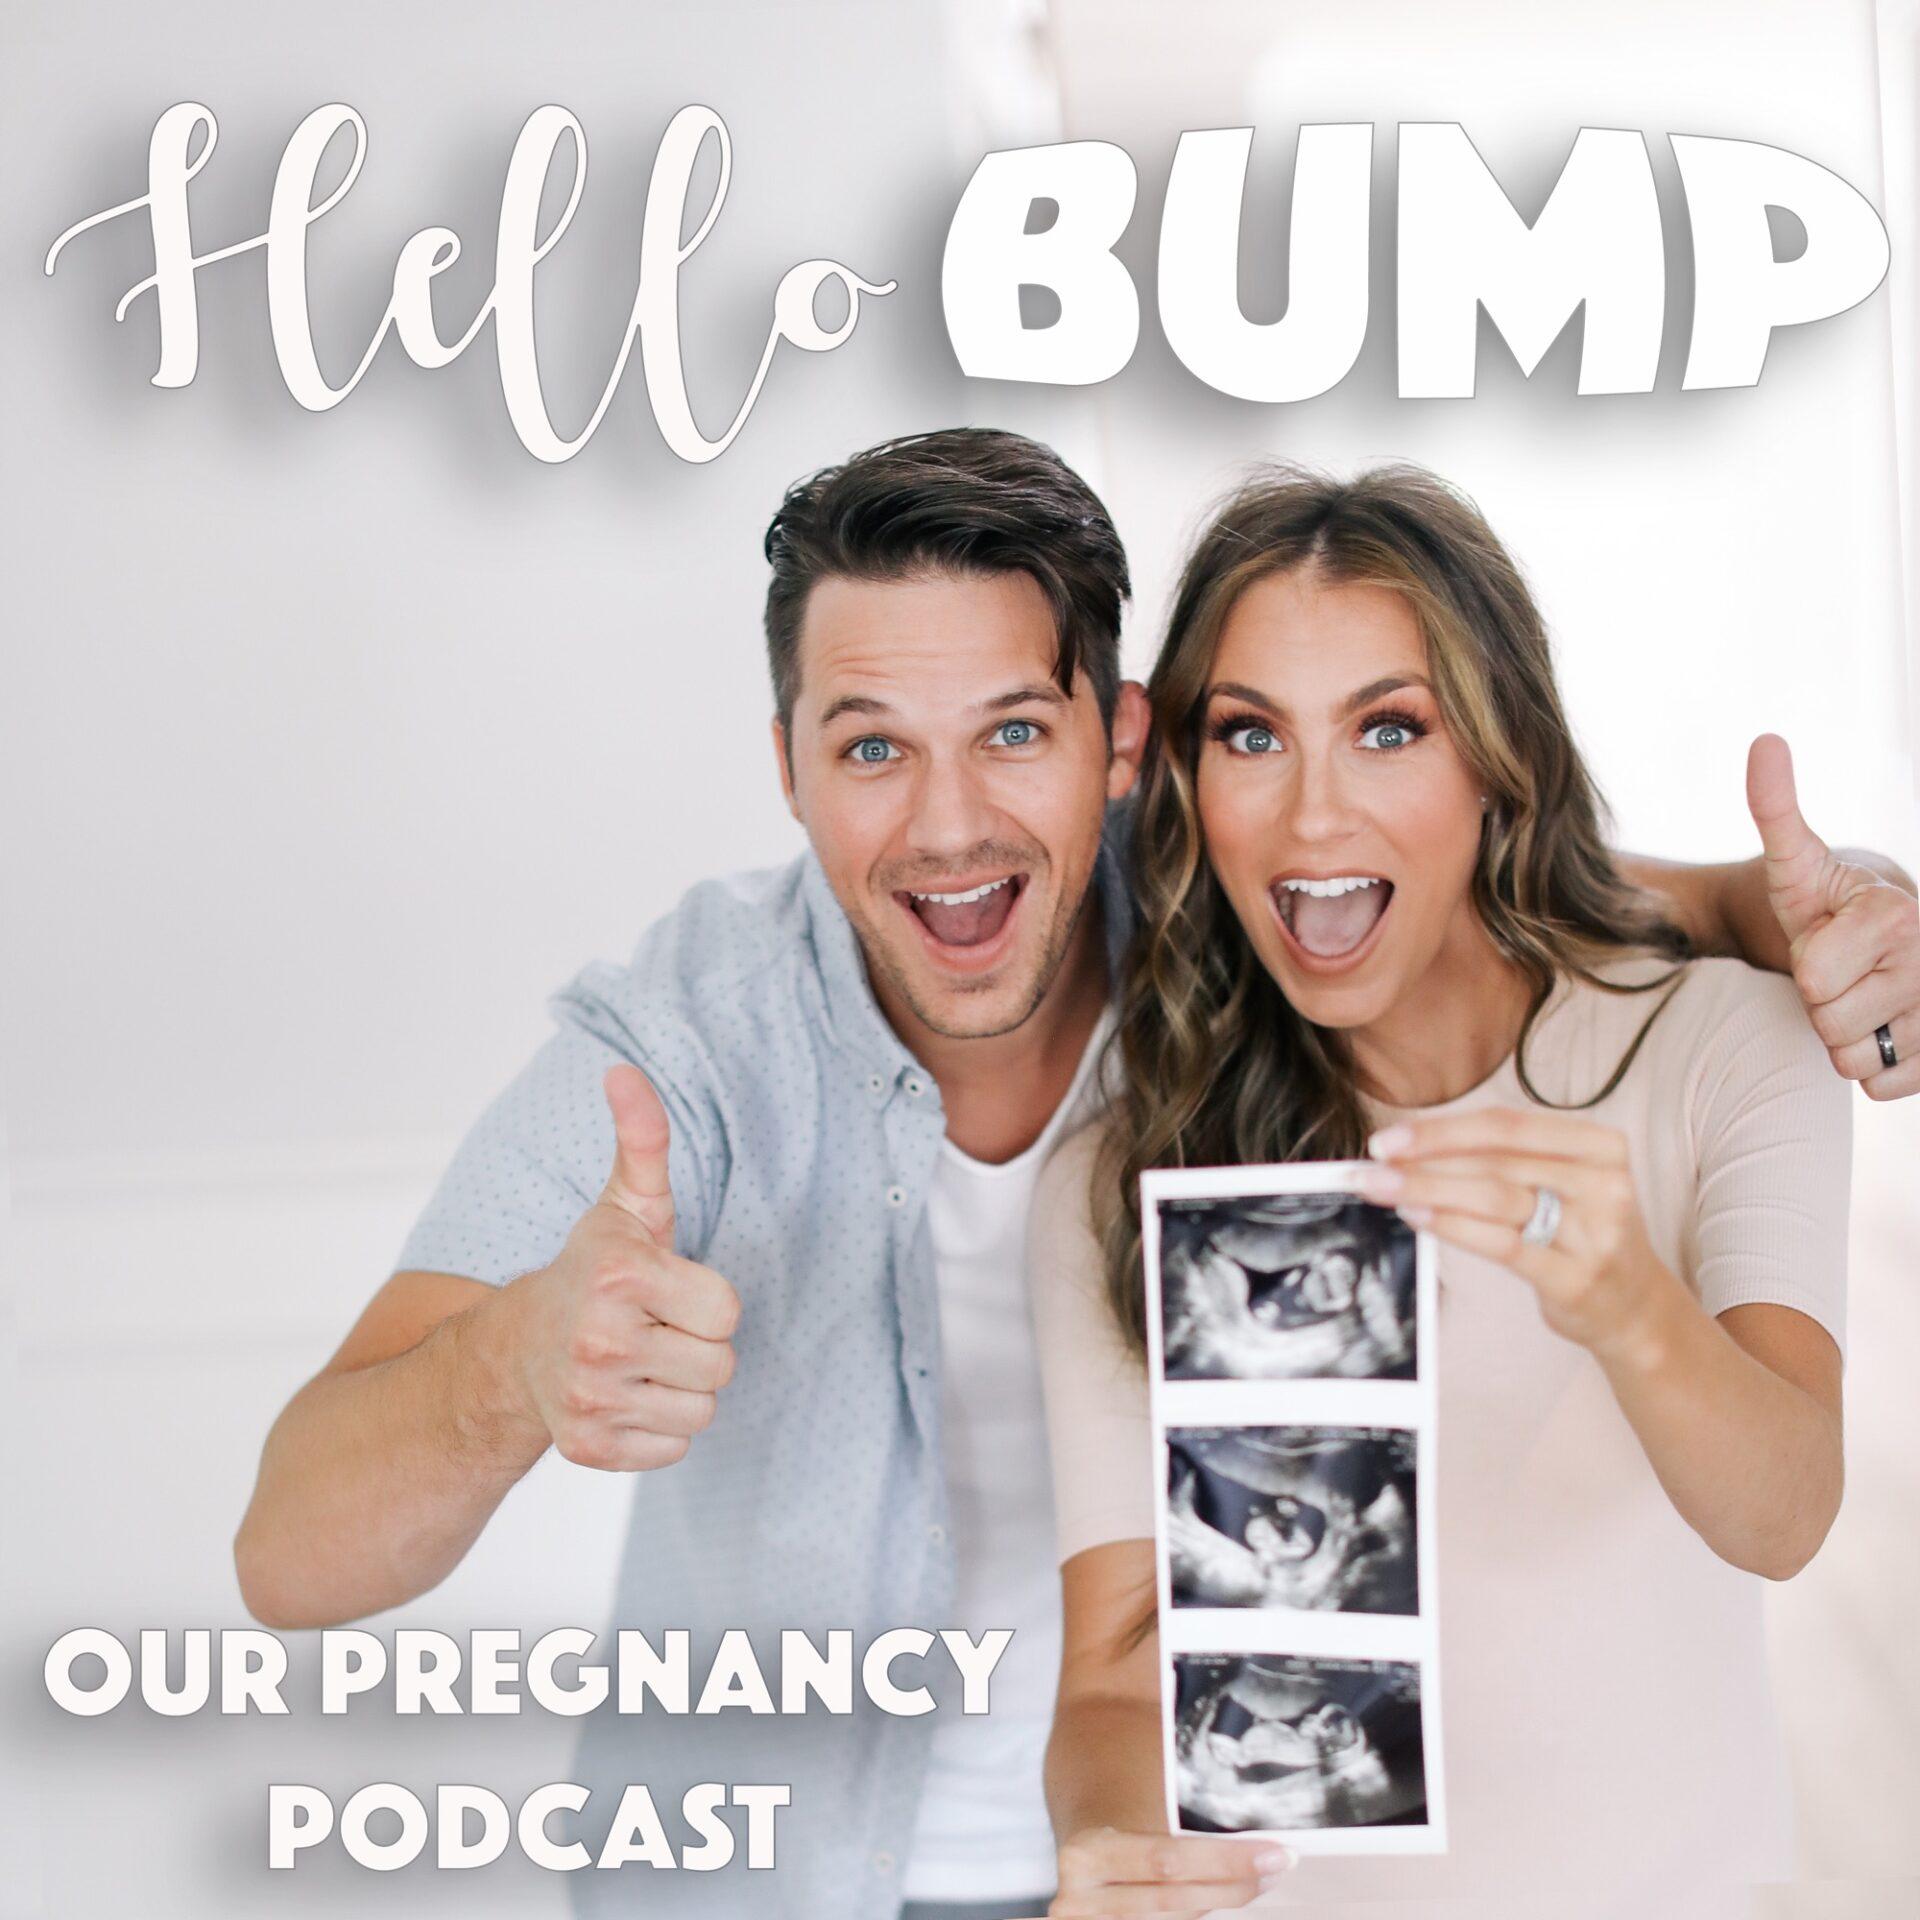 Hello Bump Podcast Episodes 2 & 3